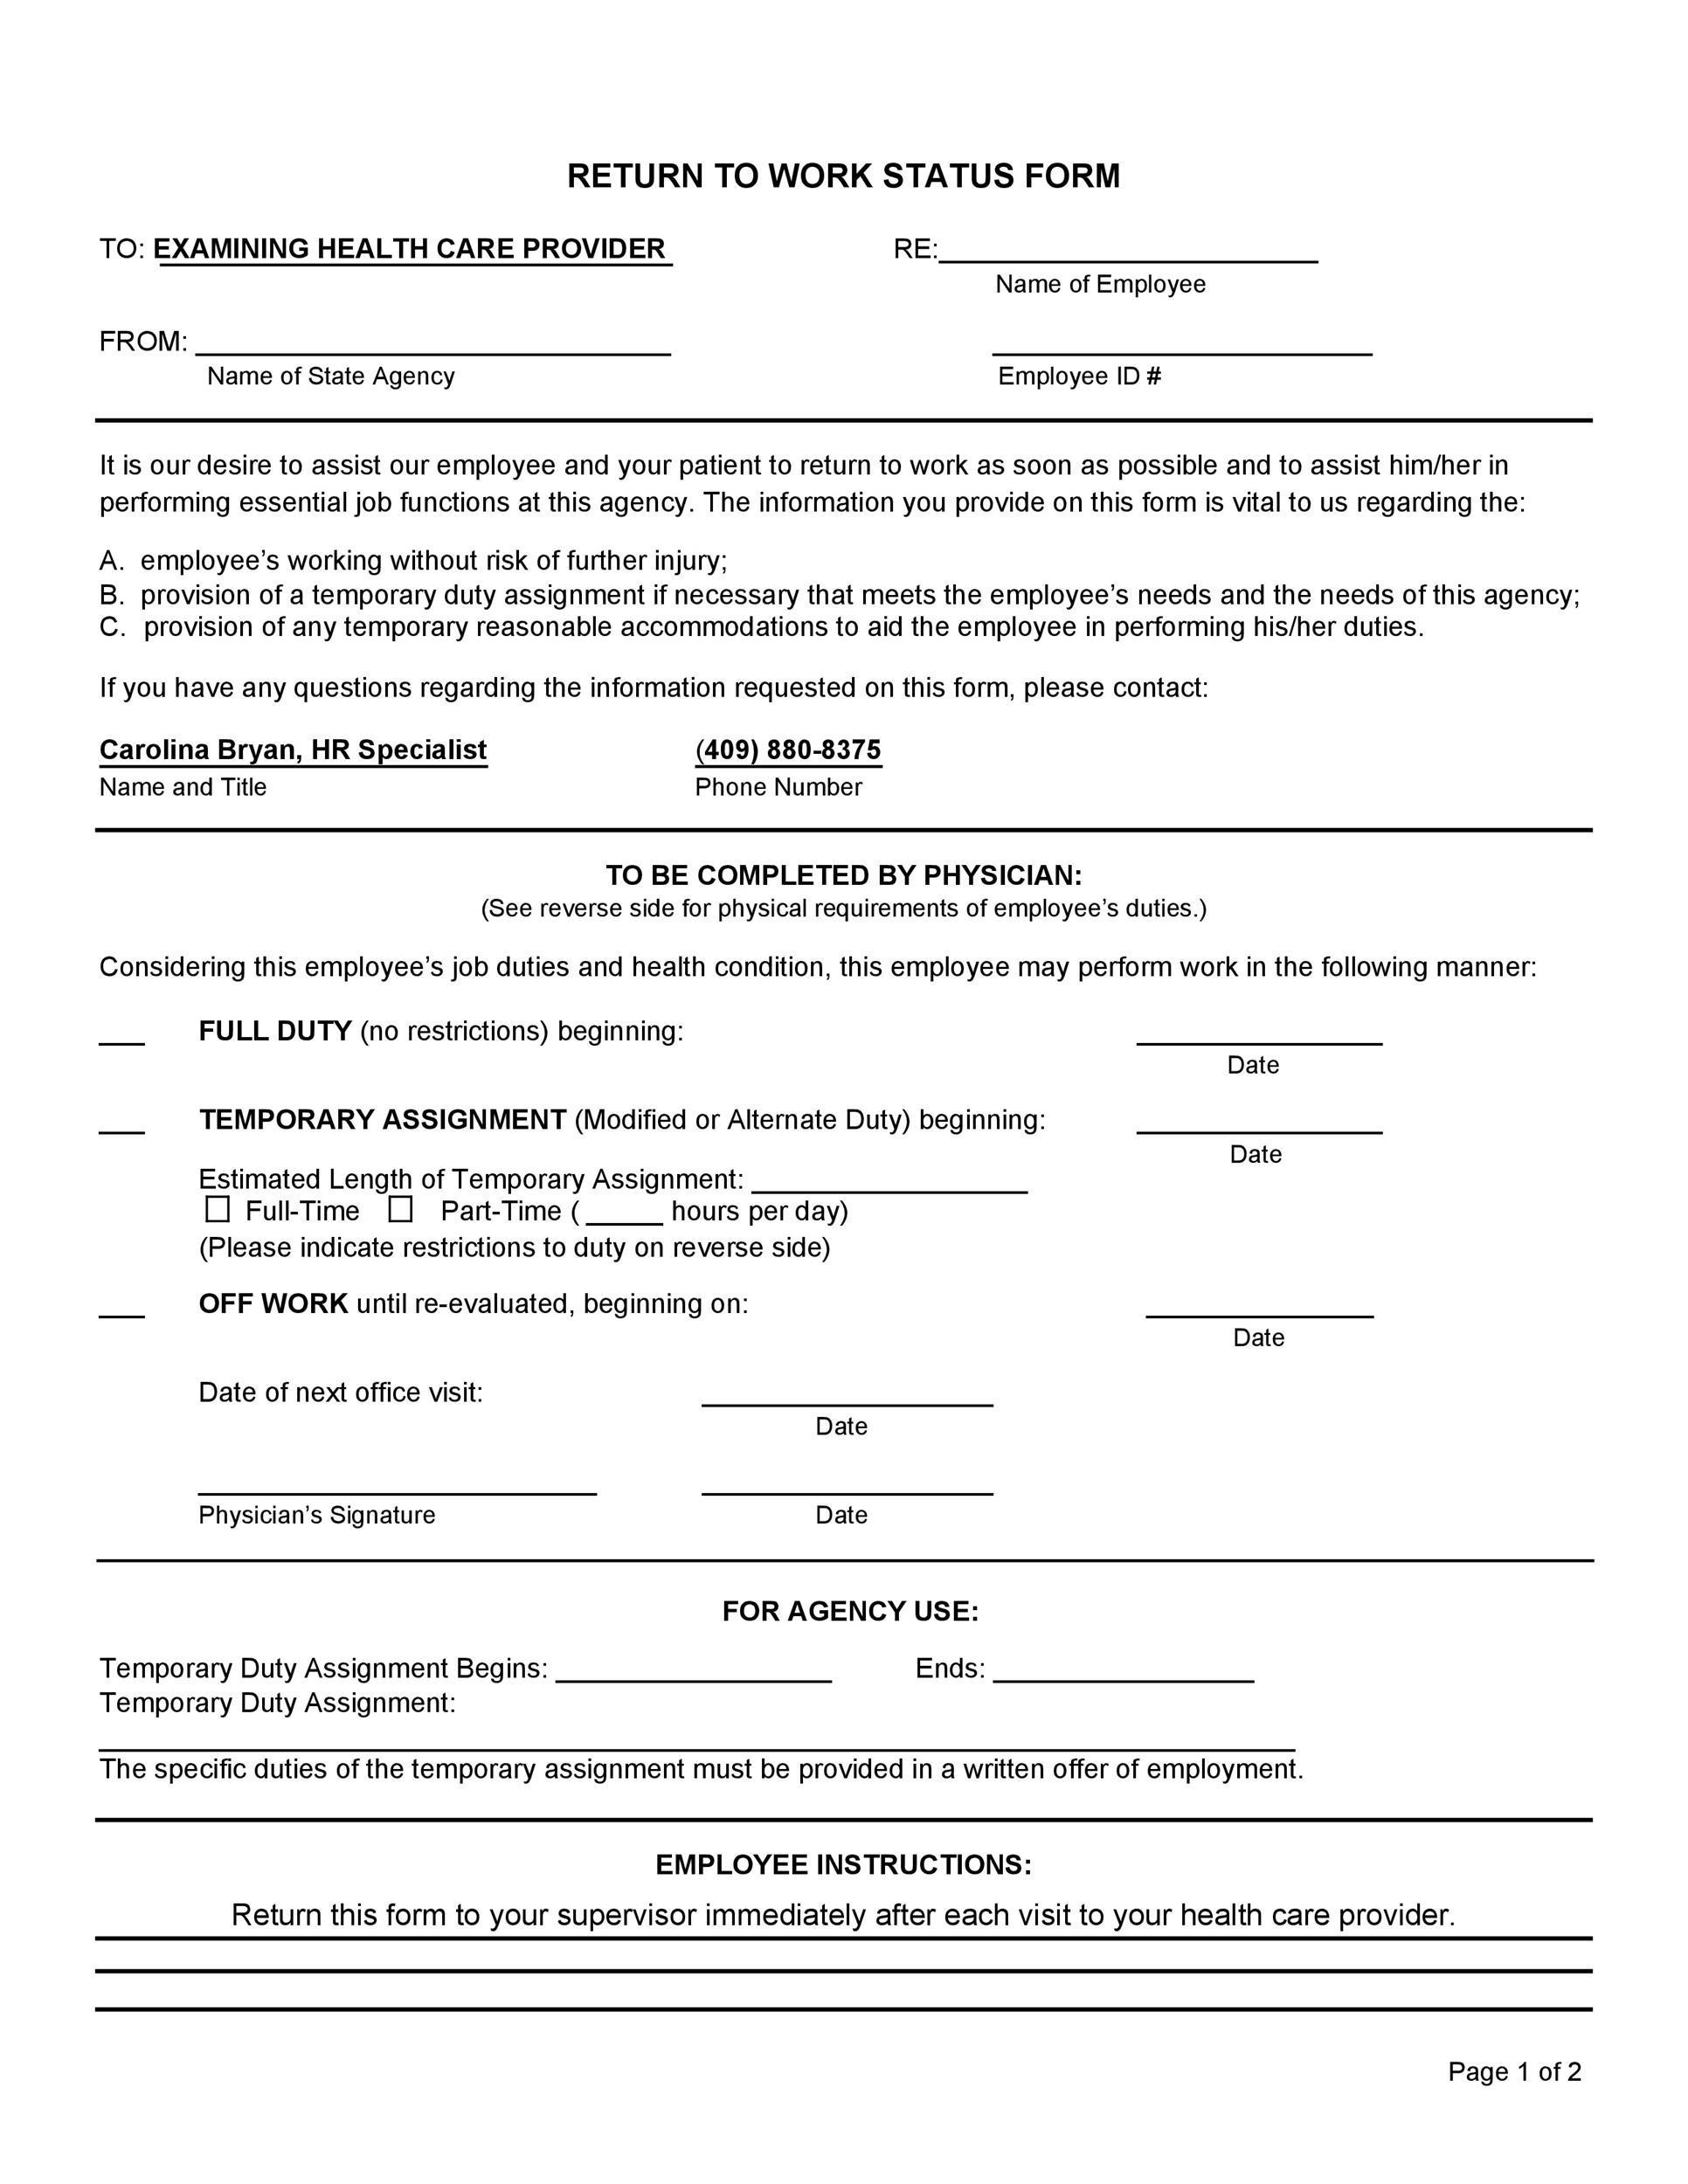 Free return to work form 43